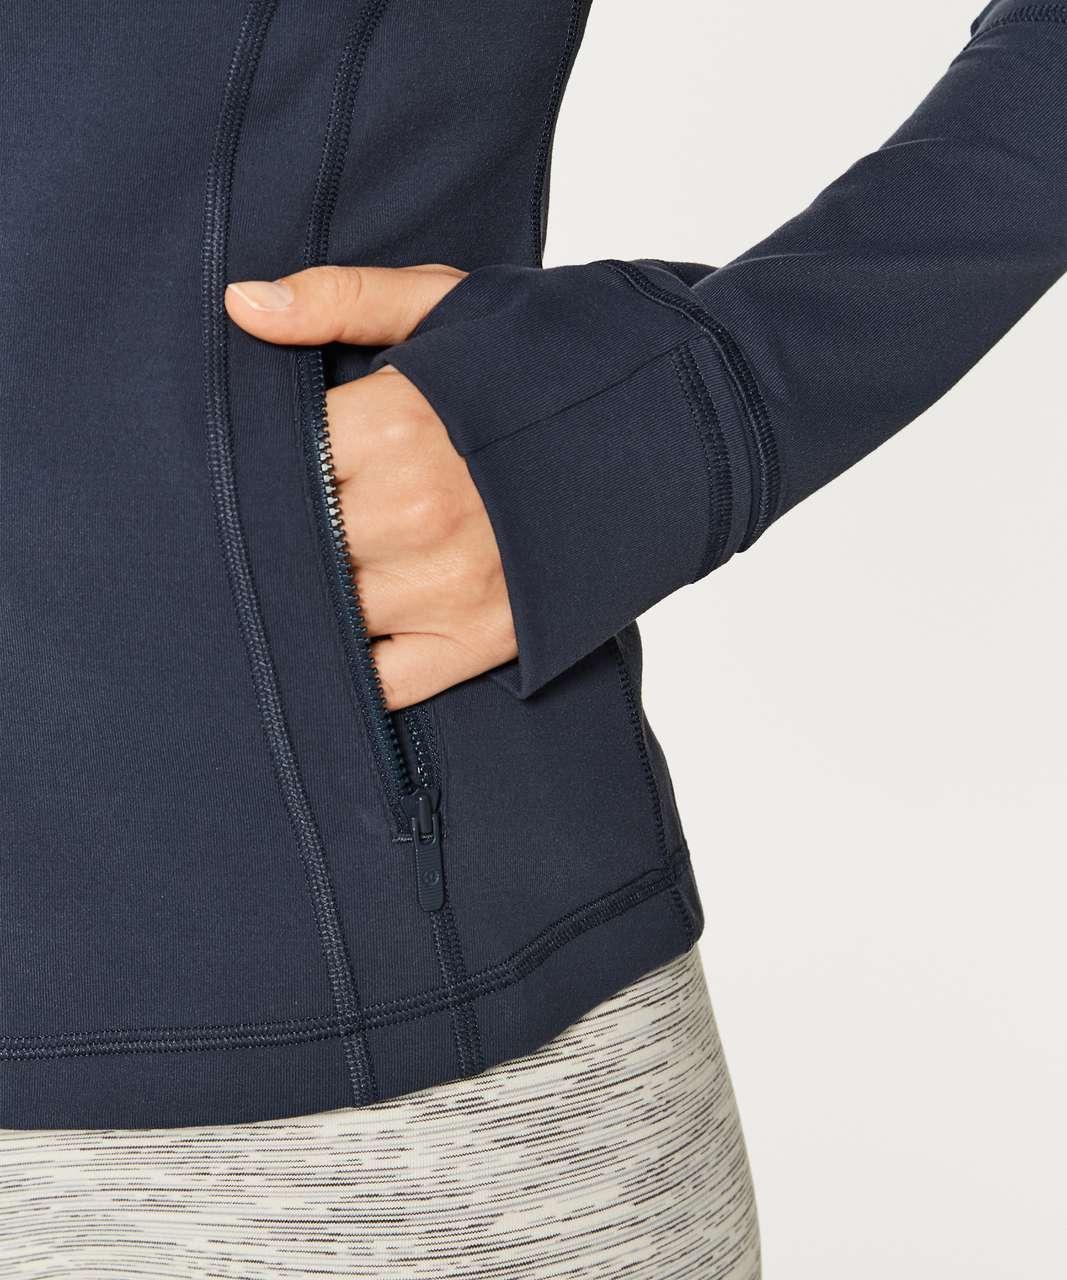 Lululemon Define Jacket - Mach Blue